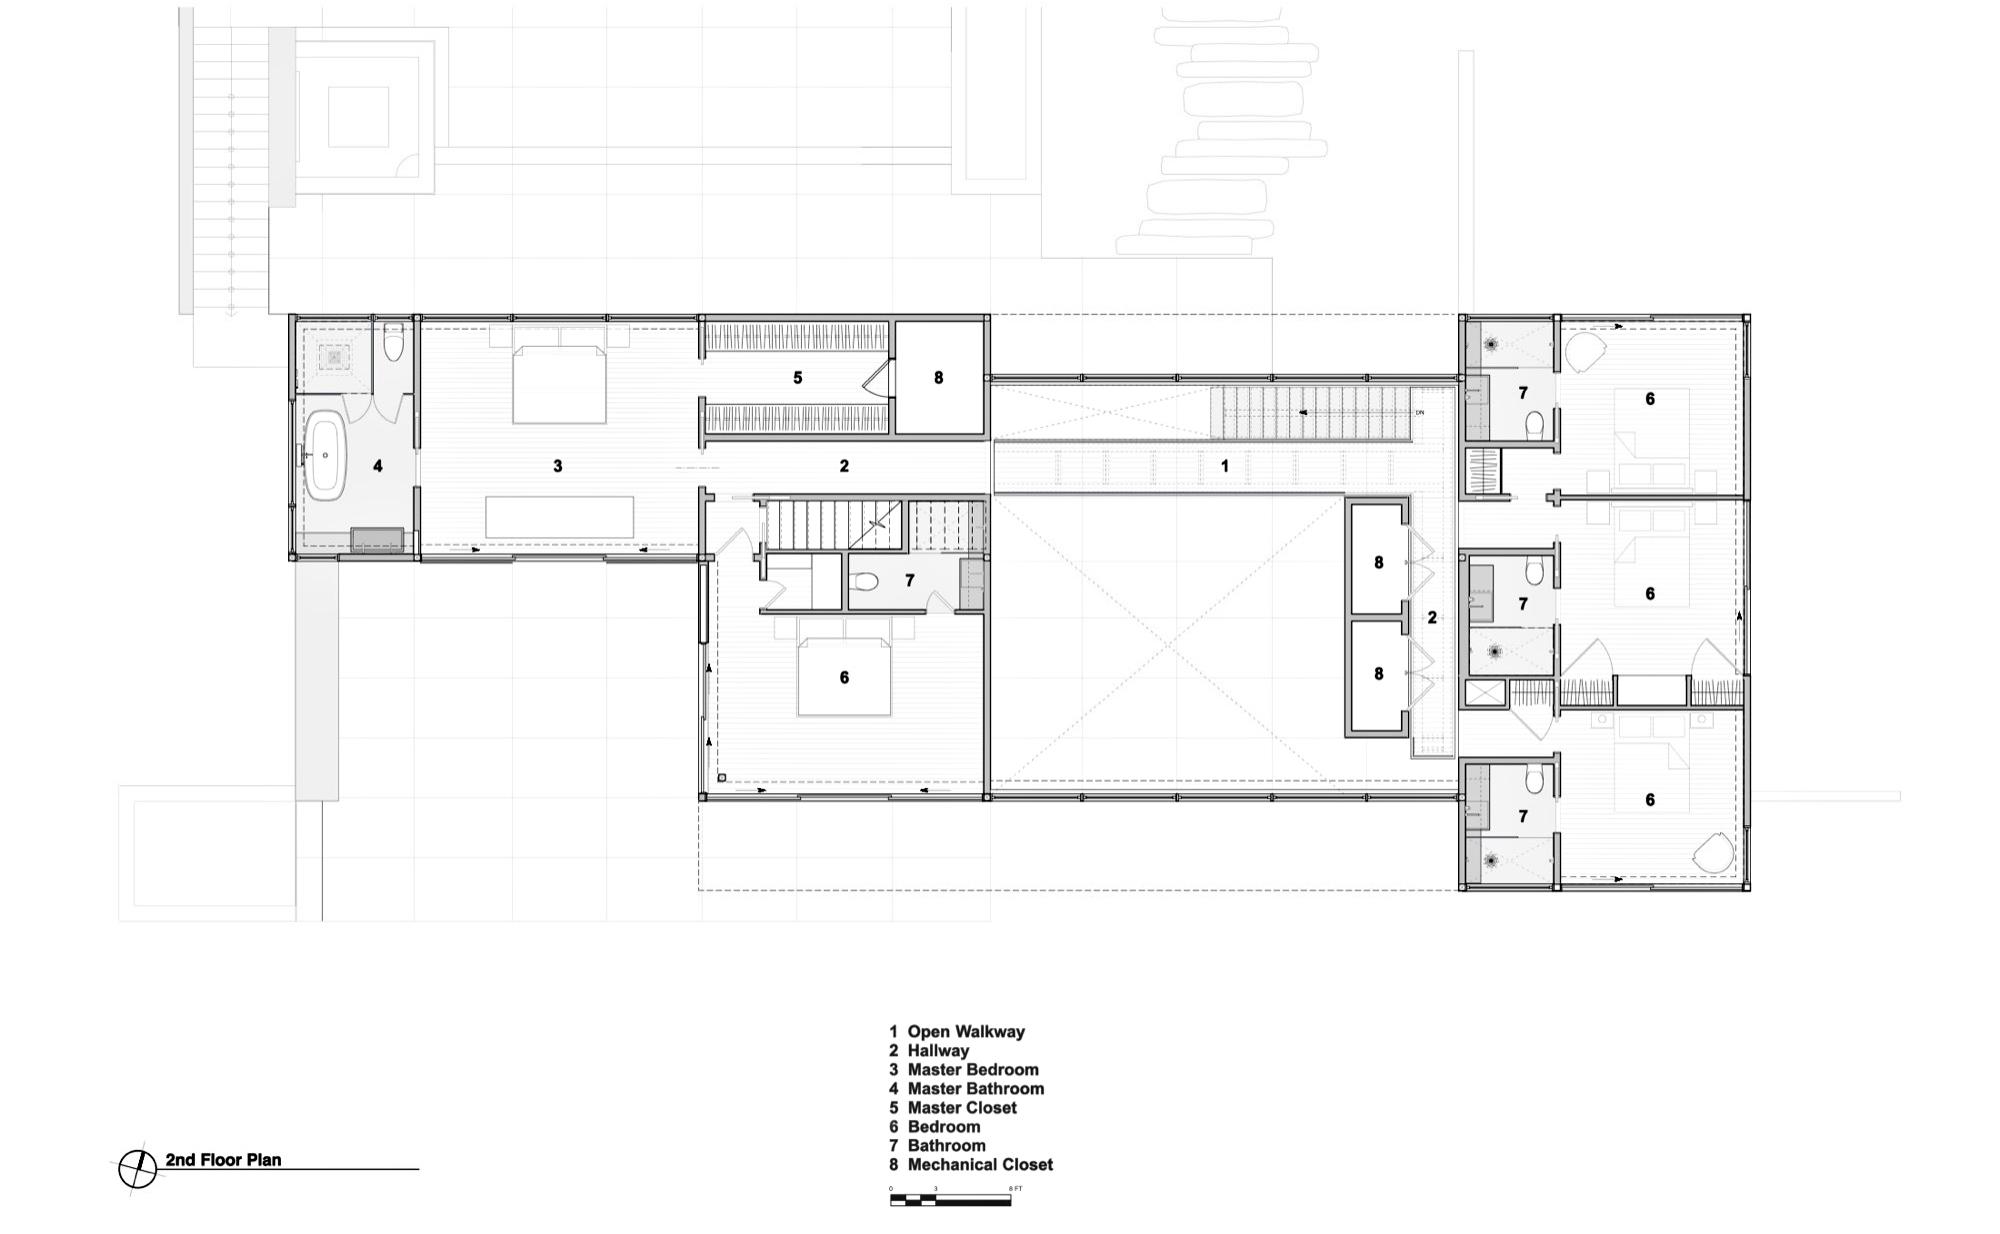 Second Floor Plan - Field House Residence - Fairfield Pond Ln, Sagaponack, NY, USA